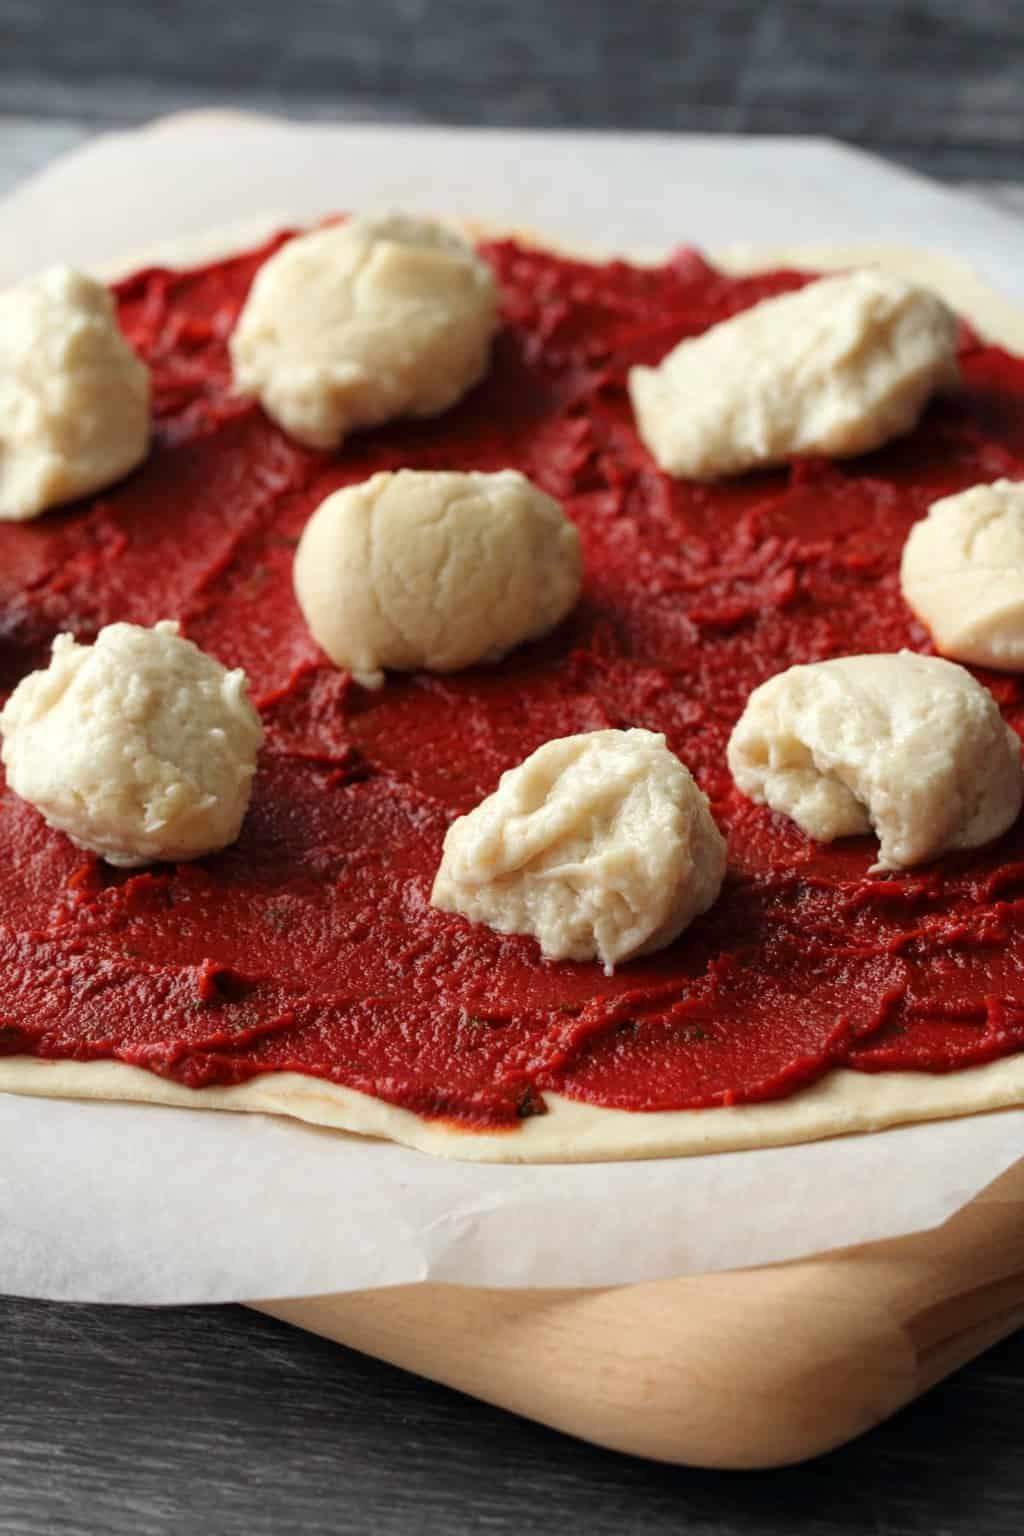 Vegan Mozzarella balls on top of a pizza ready to go into the oven.